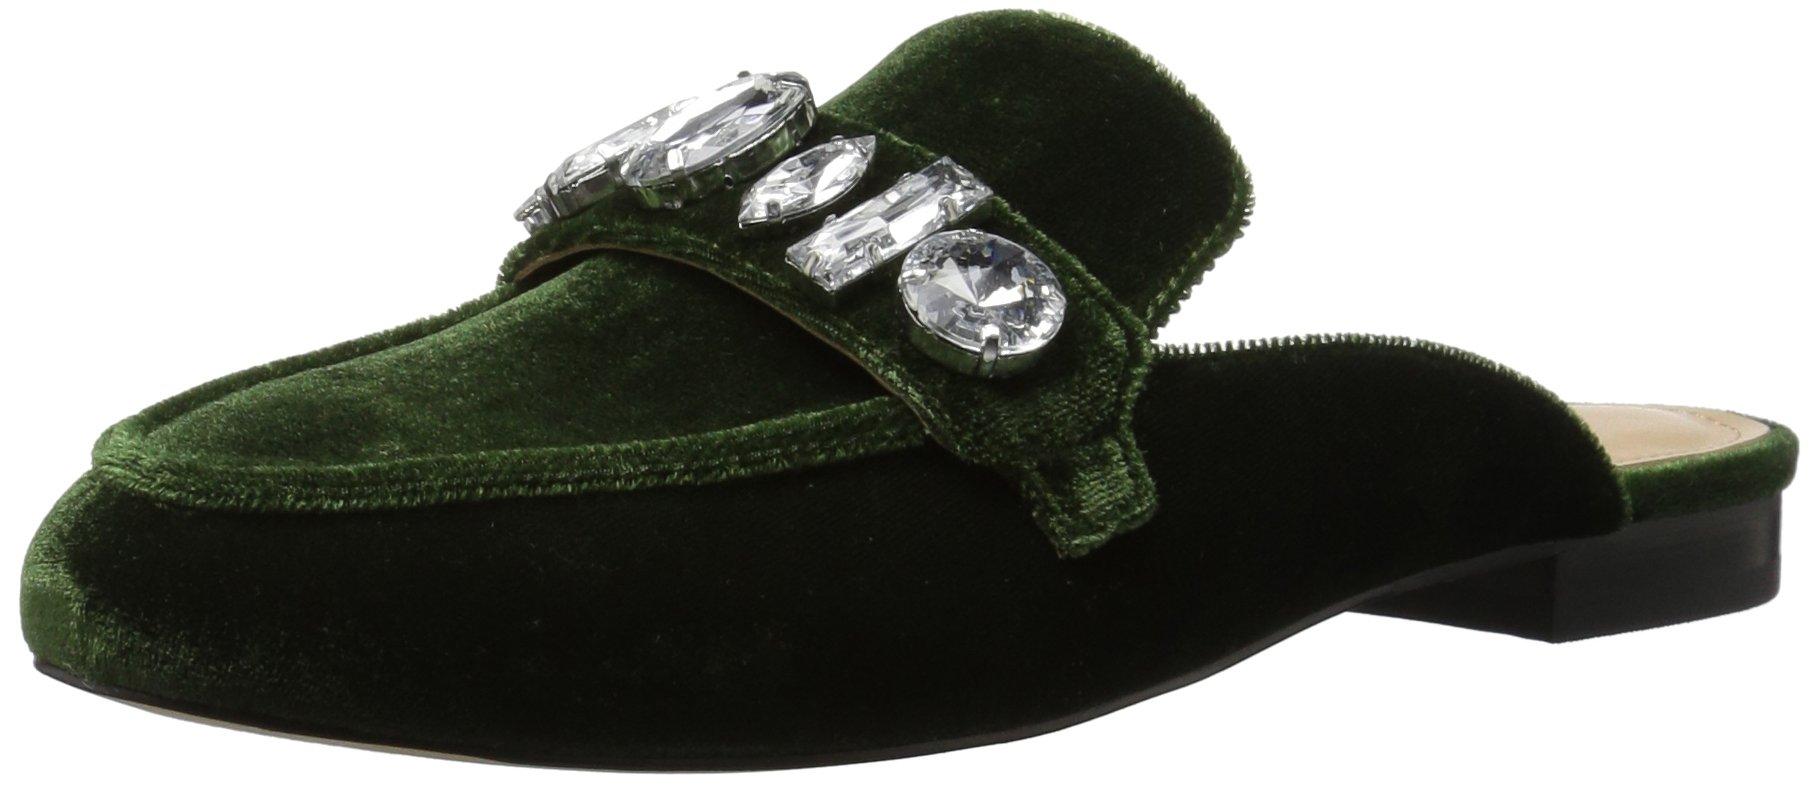 The Fix Women's Francesca Slip-On Loafer Large Jewels, Black/Multi, 9.5 B US